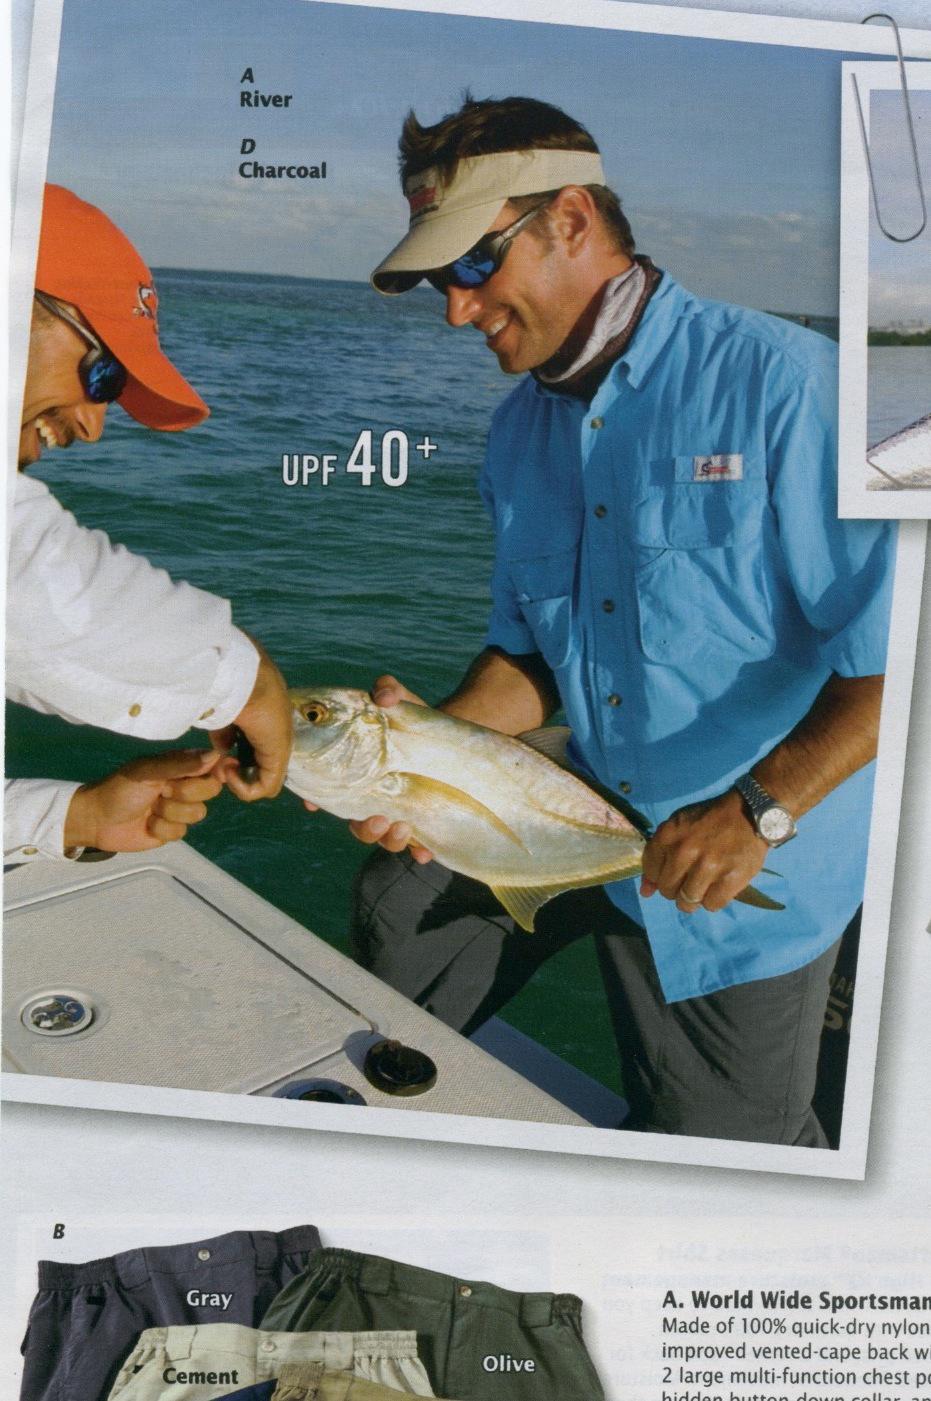 peter bass pro catalog 2010 3_LG